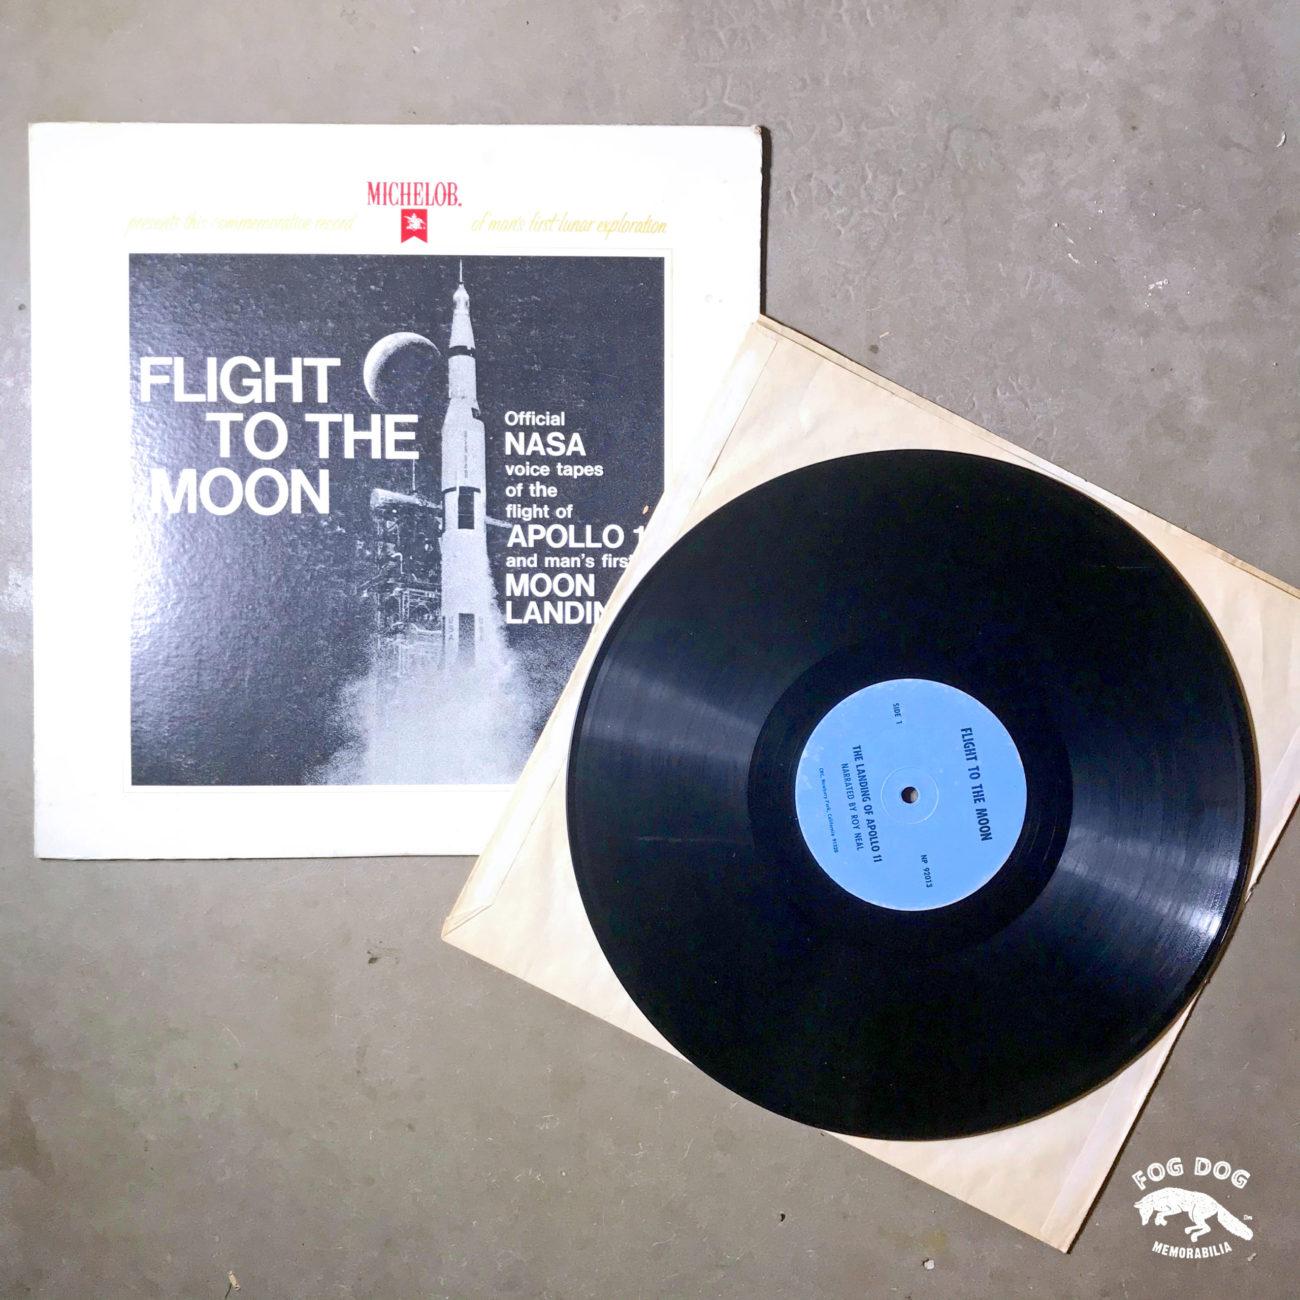 LP deska FLIGHT TO THE MOON - oficiální nahrávka